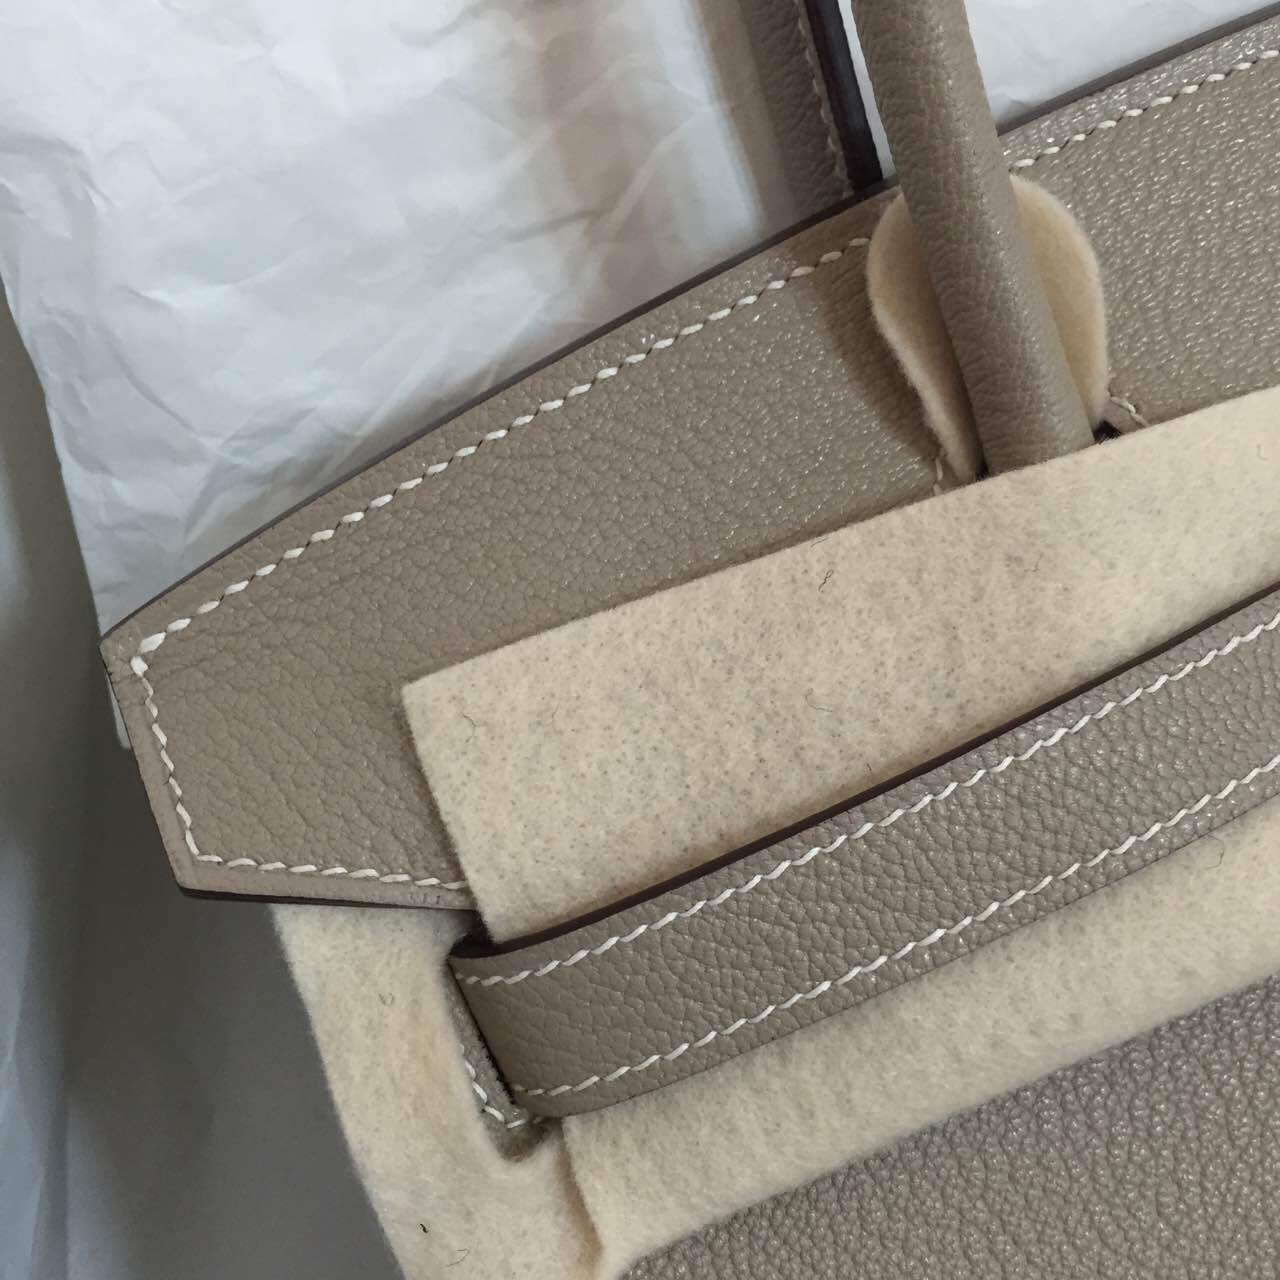 Discount Hermes Birkin30 Bag Light Grey Chevre Leather Silver Hardware